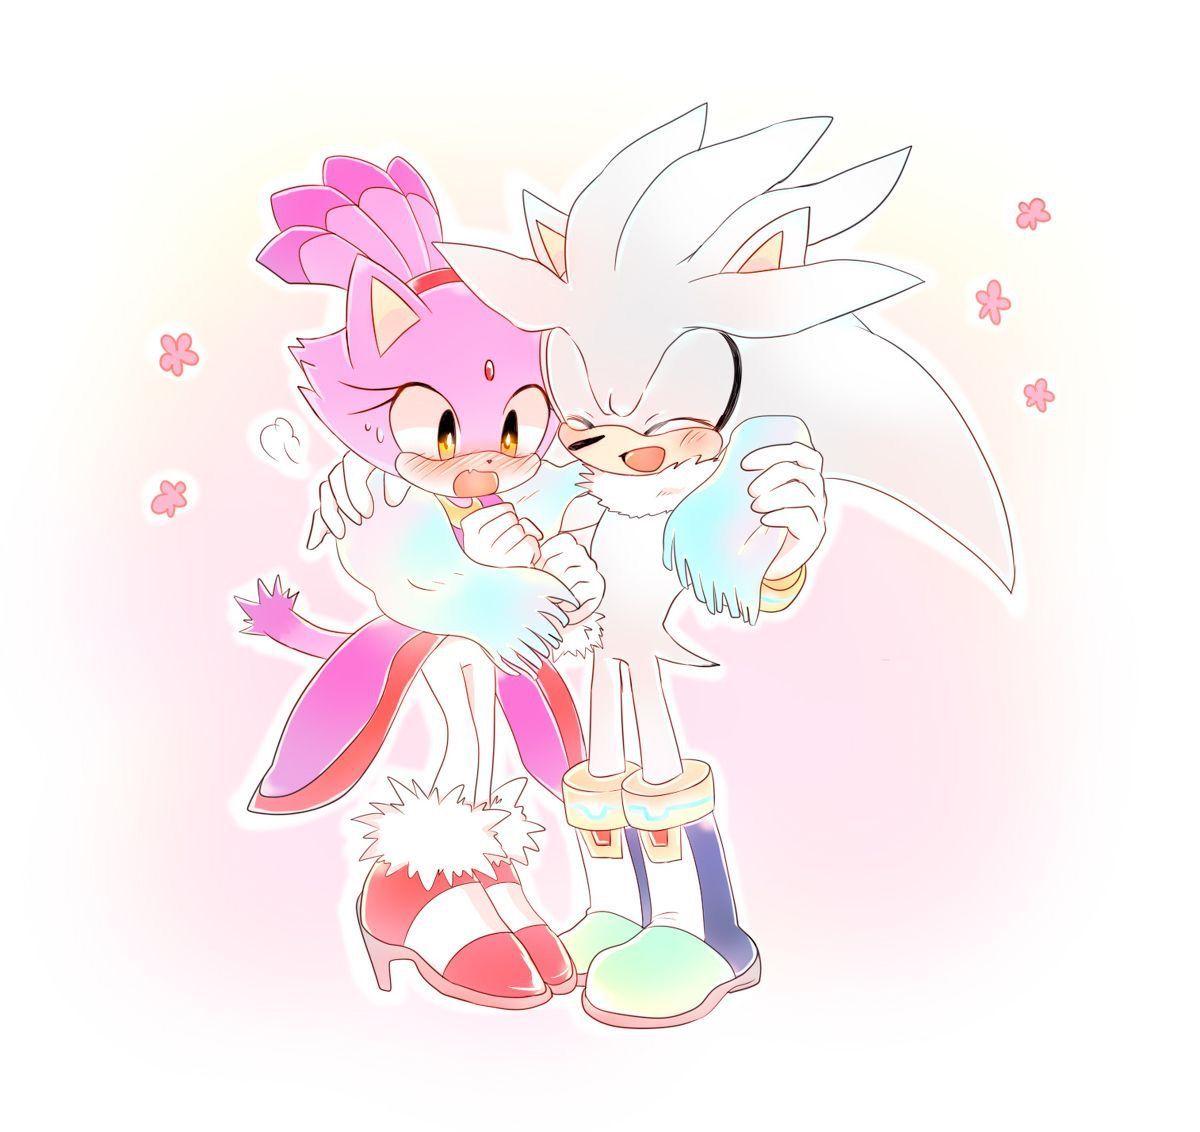 Comics Al Espanol E Imagenes De Sonic Terminado Como Dibujar A Sonic Sonic Arte Erizo